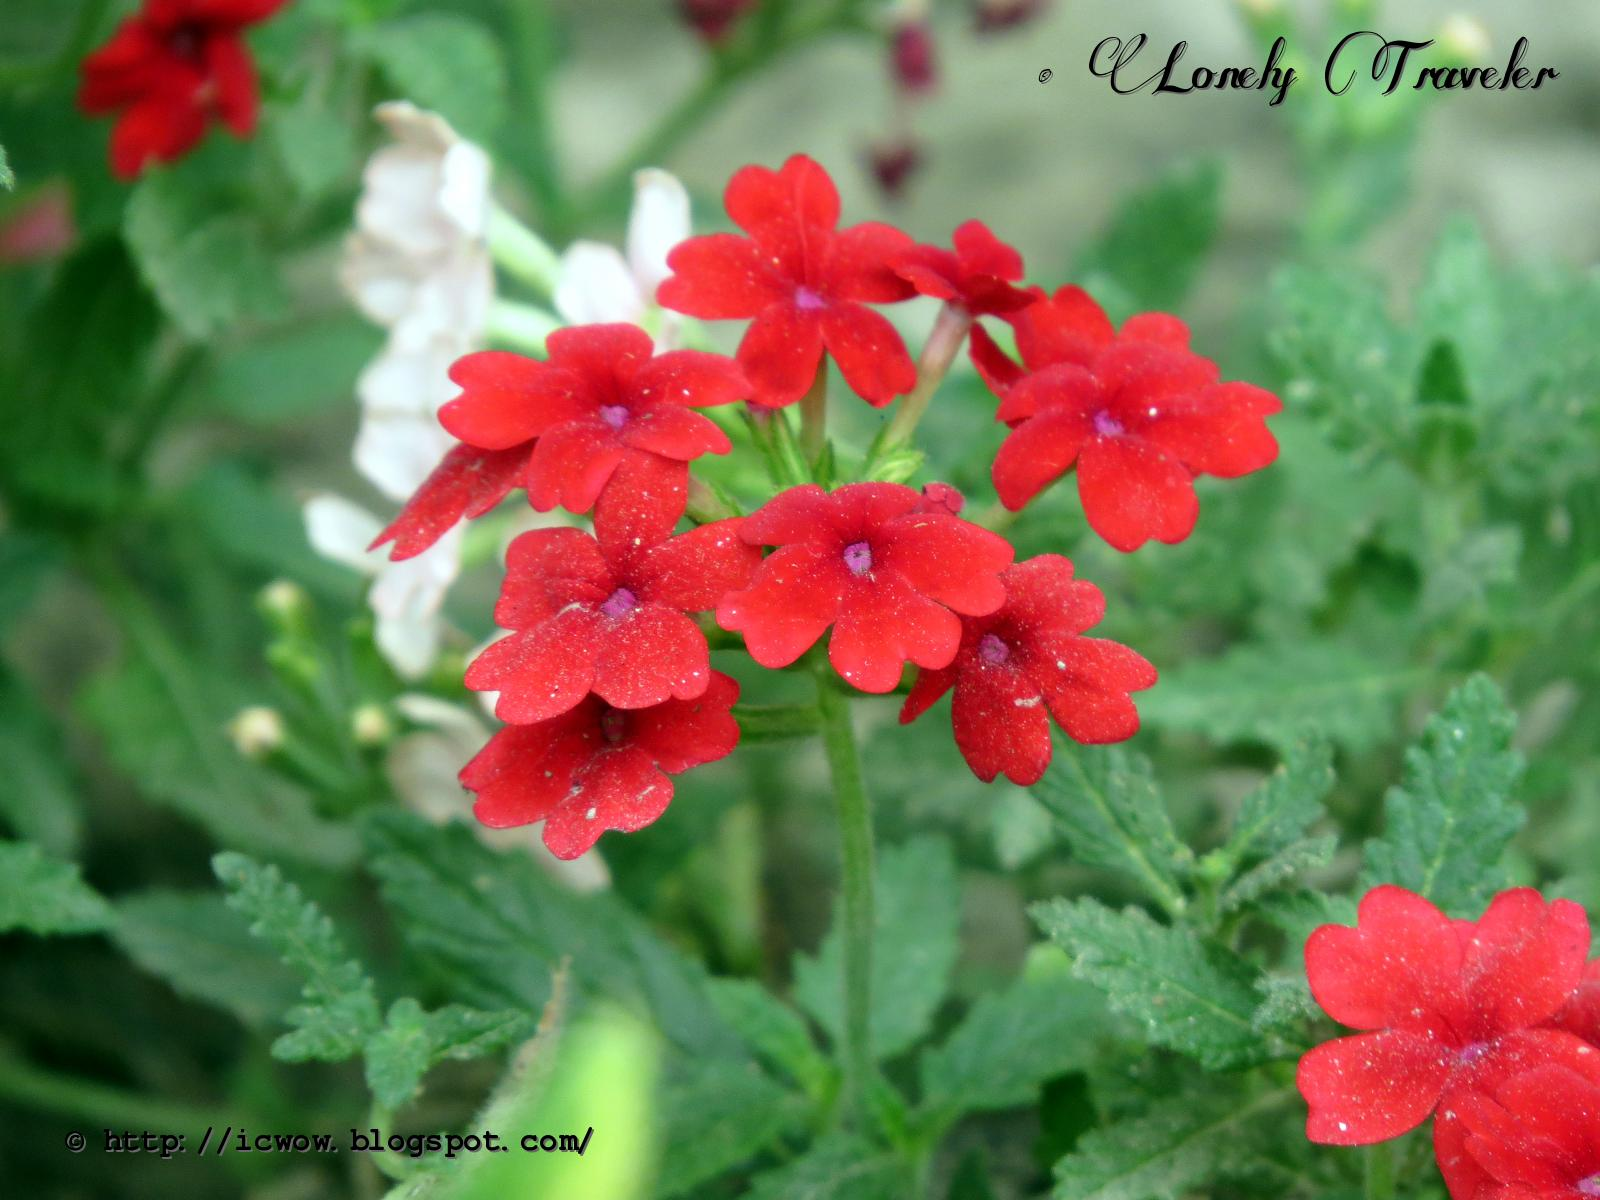 Lonely Traveler Verbena flower ভার্বেনা ফুল Verbena x hybrida